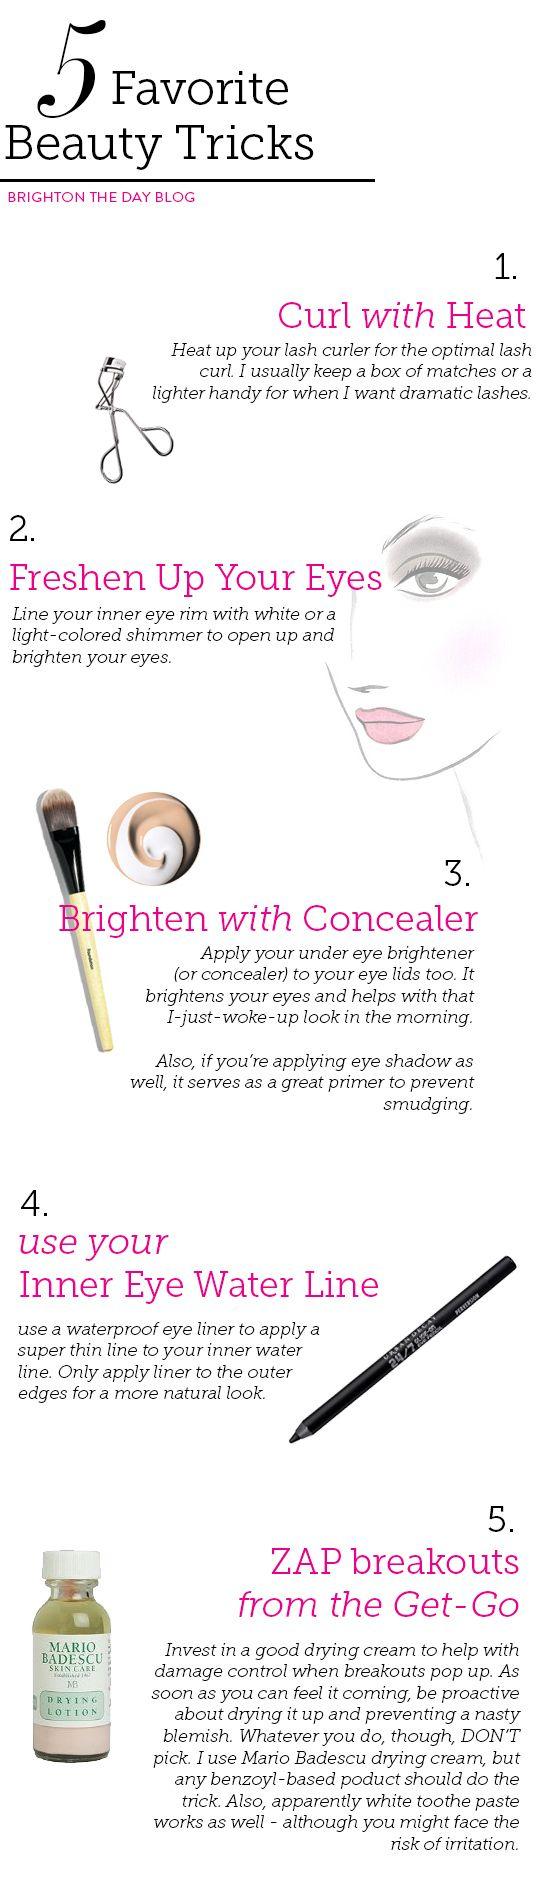 Five Favorite Beauty Tricks via BrightonTheDay Blog